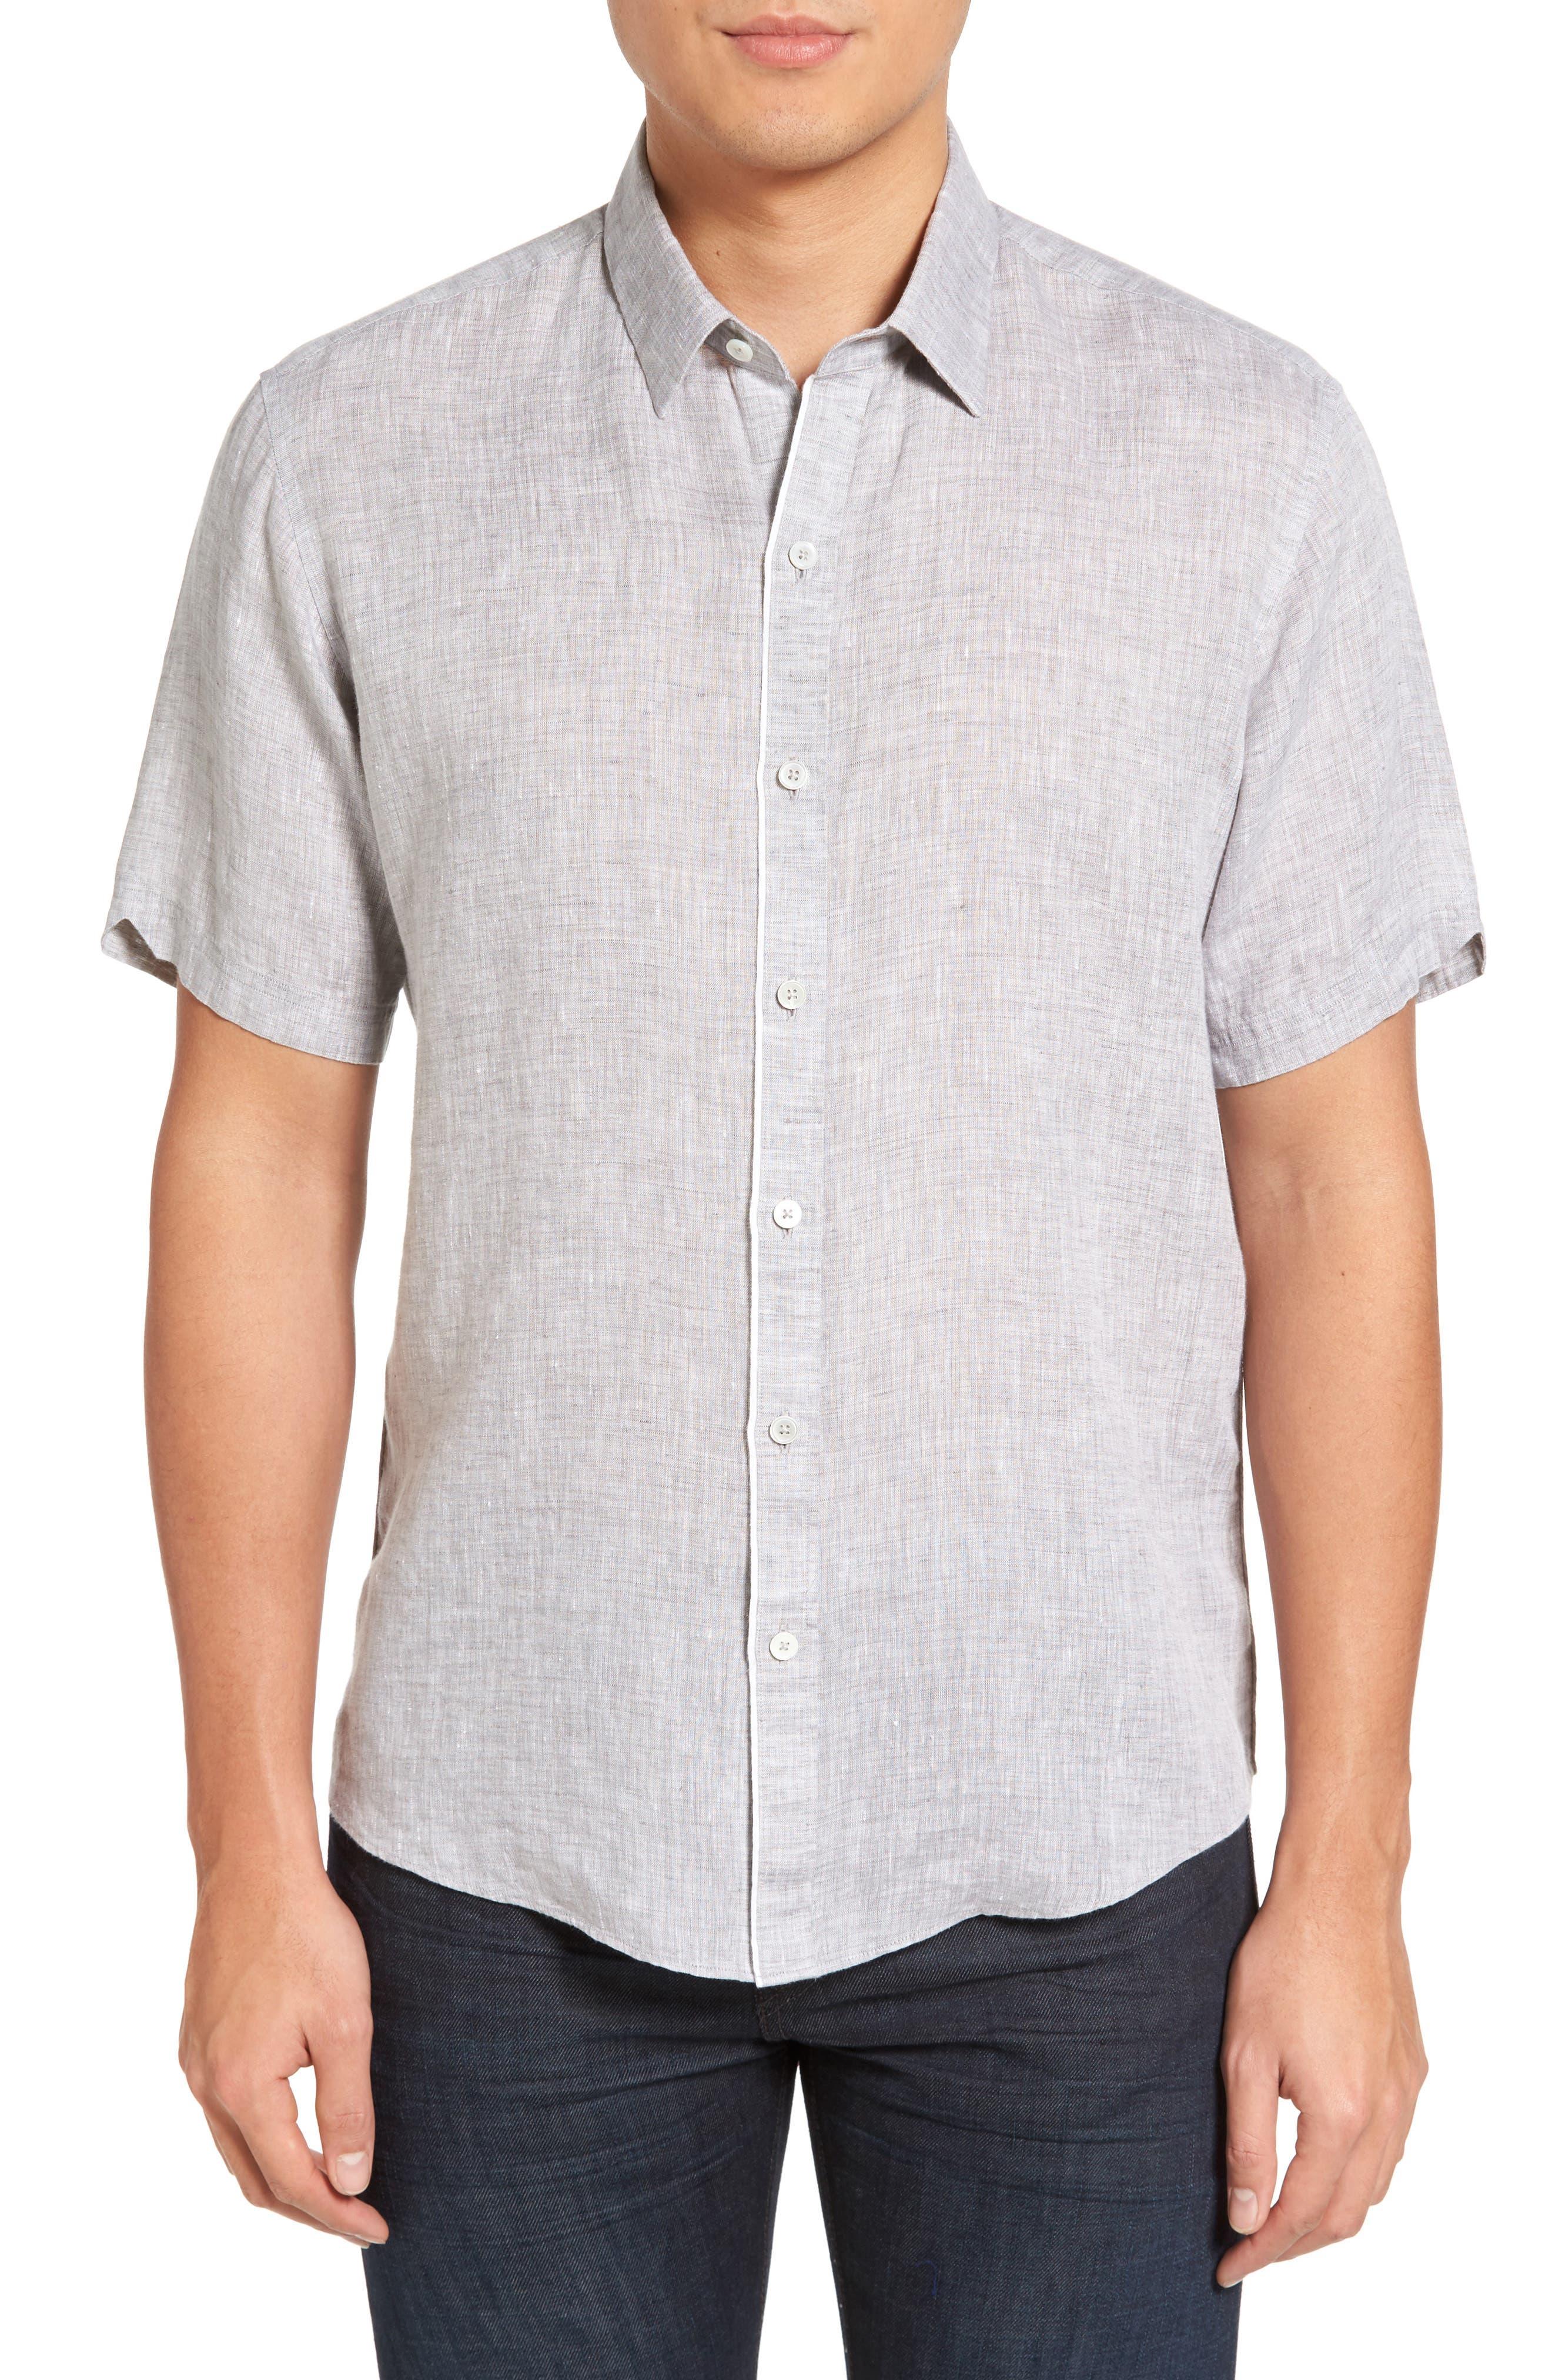 Kaplan Slim Fit Linen Sport Shirt,                             Main thumbnail 1, color,                             020